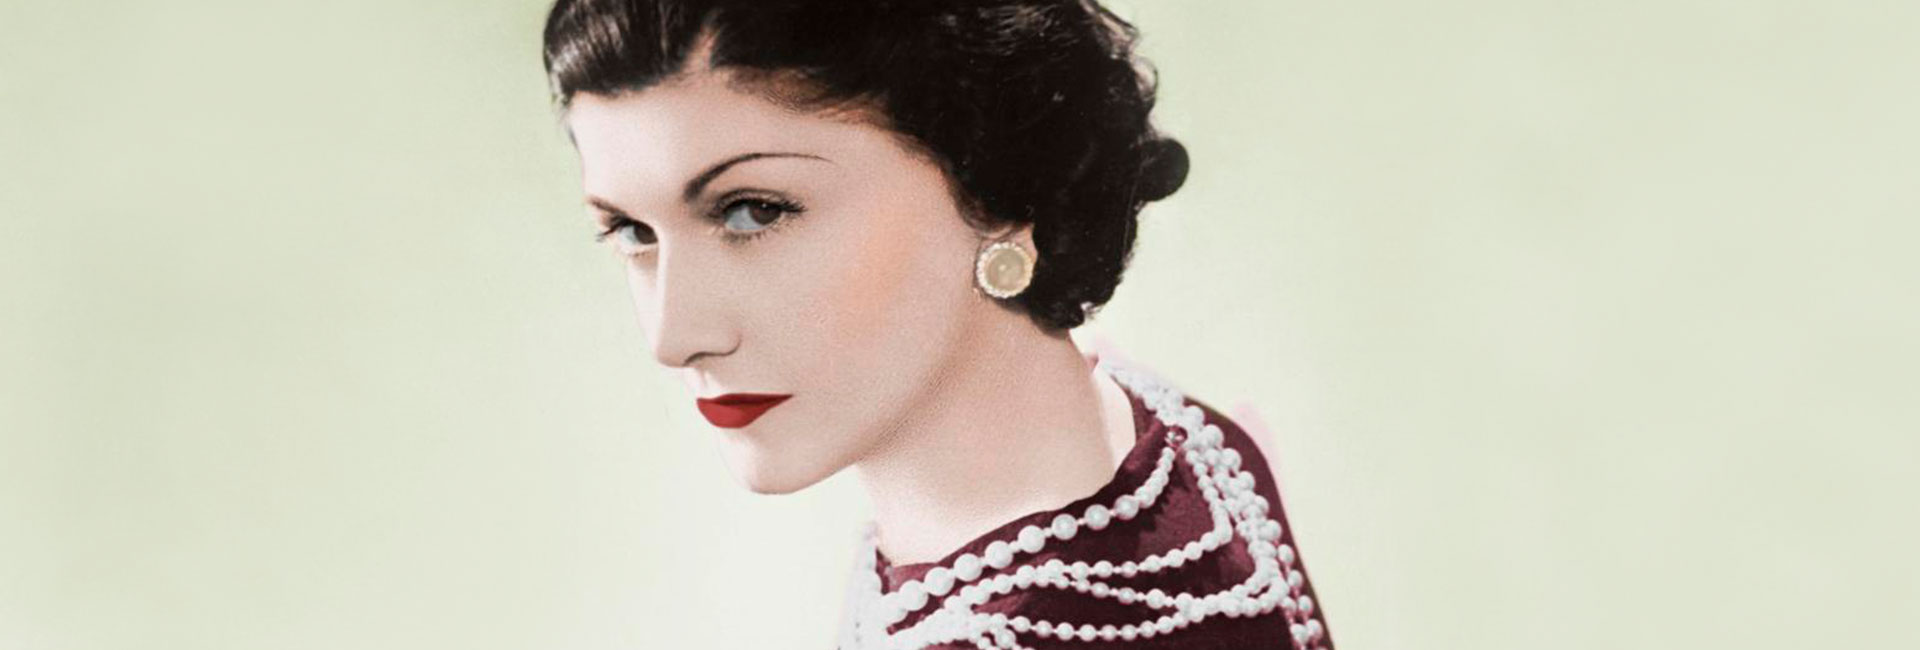 Las Mejores Frases De Coco Chanel The Beauty Effect